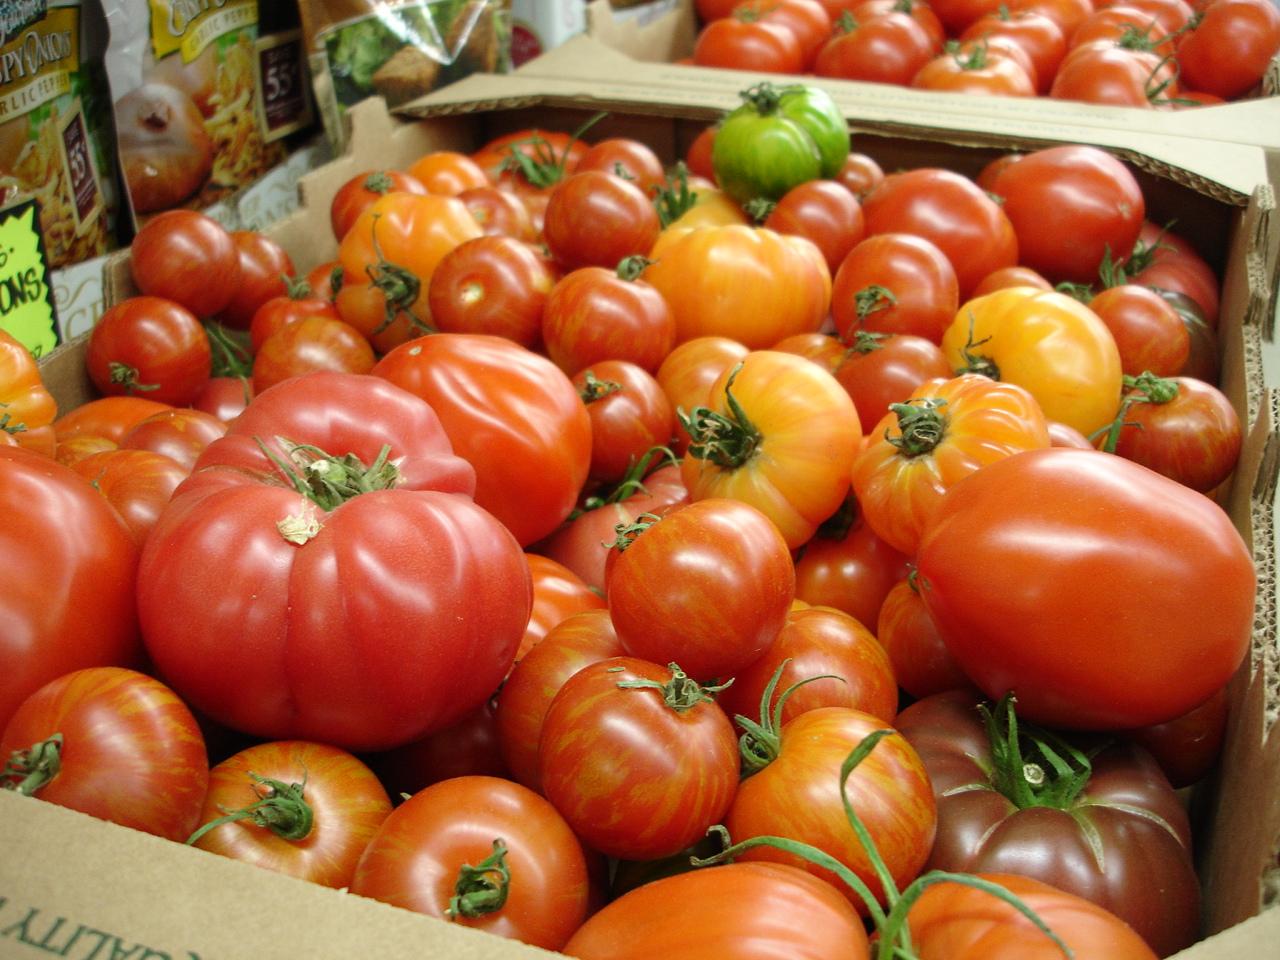 Hydroponic Heirloom Tomatoes McWethy Farms, Three Oaks, MI